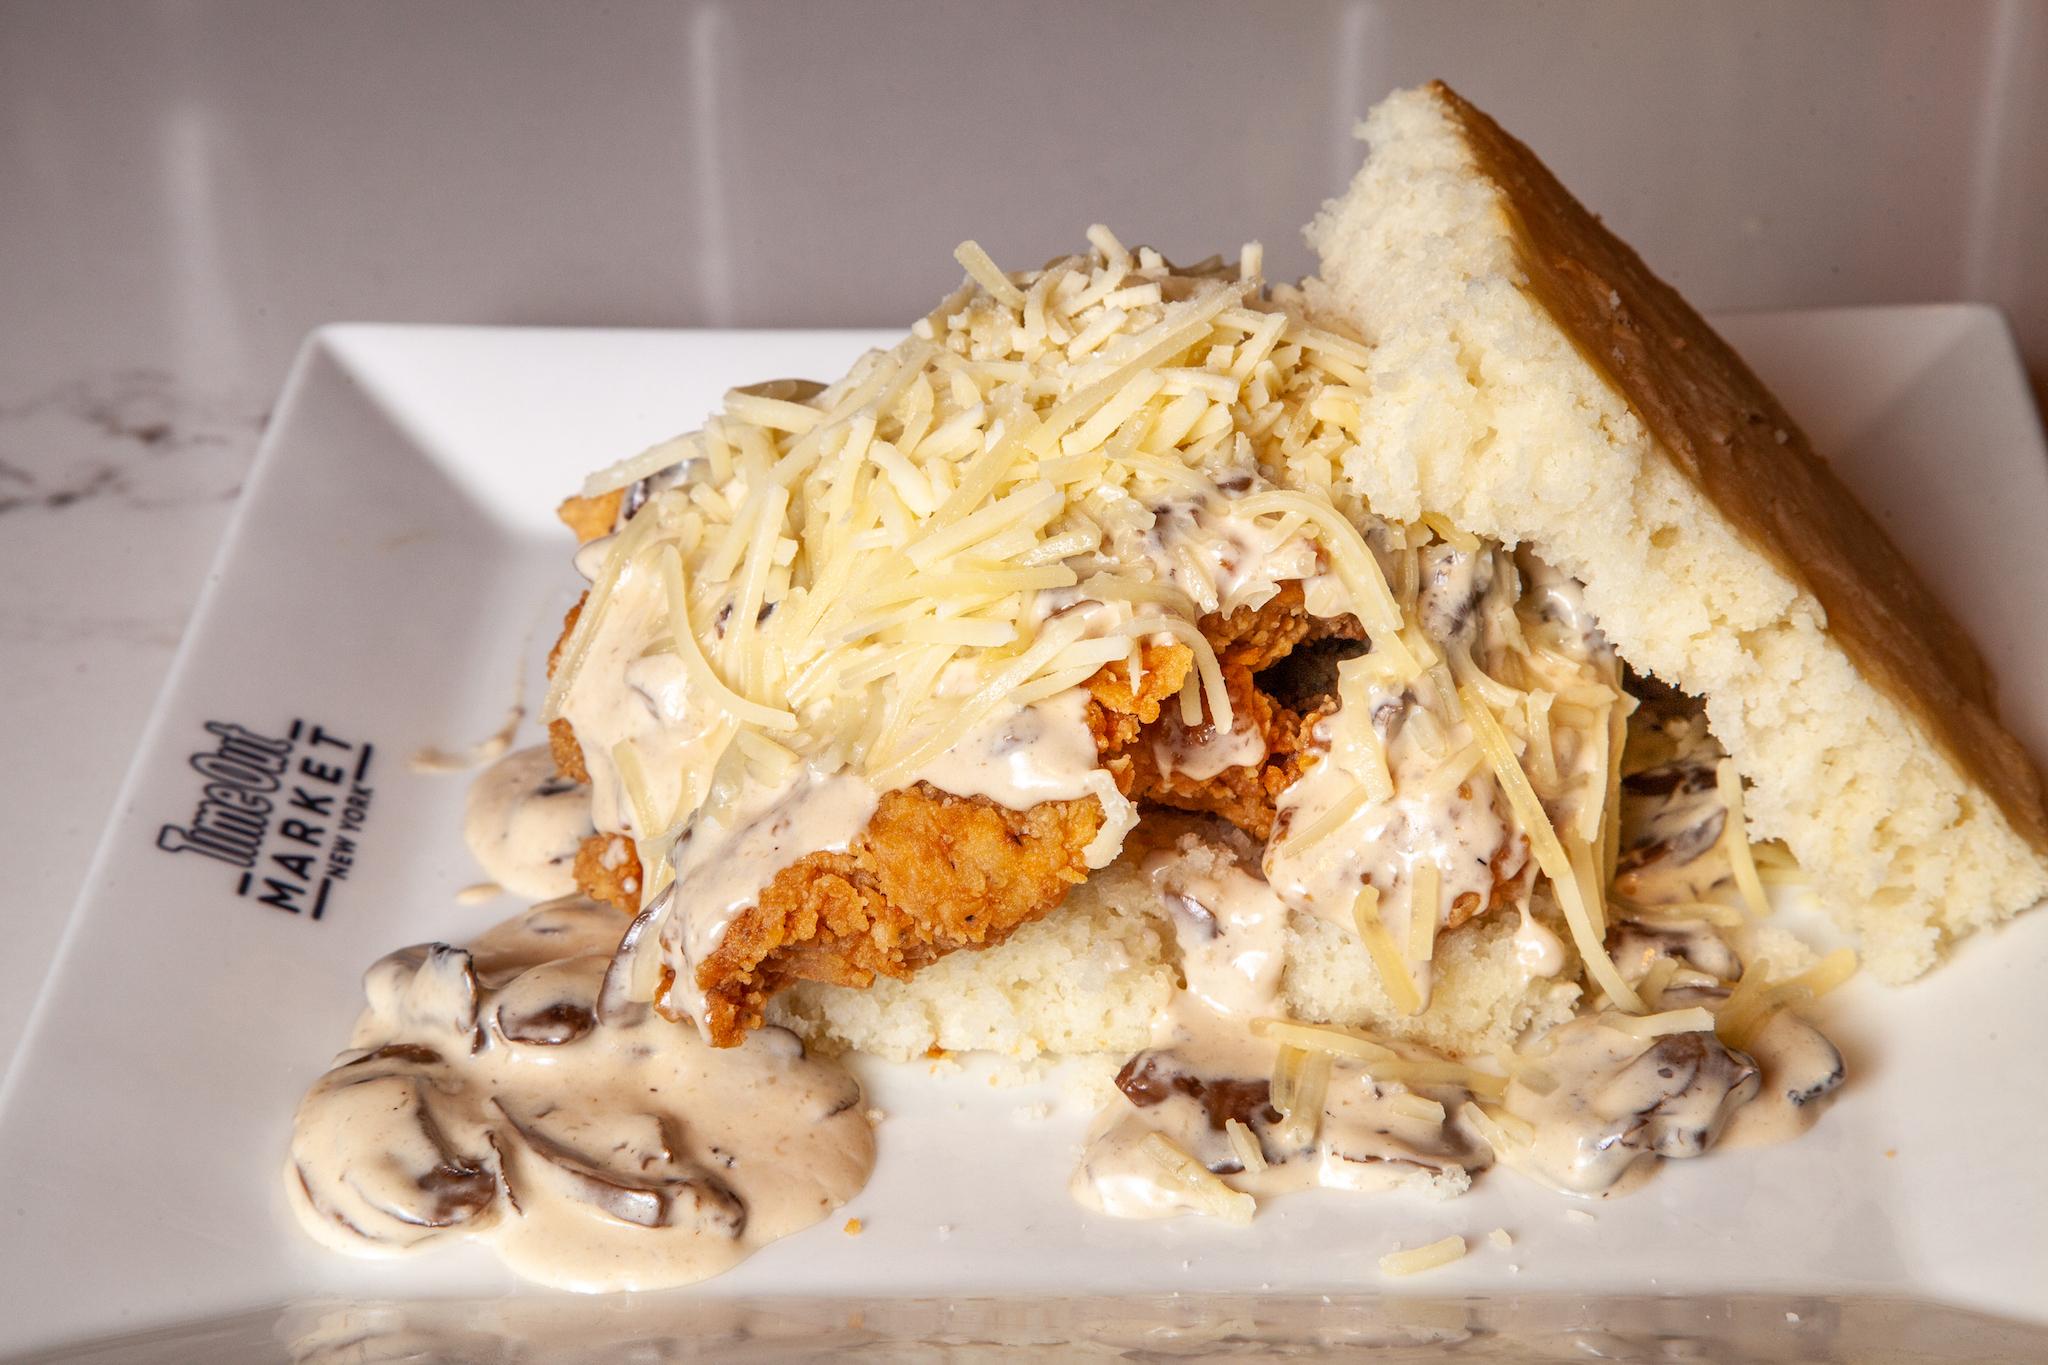 Food Envy: Jacob's Pickles's Mushroom Gravy Fried Chicken Sandwich